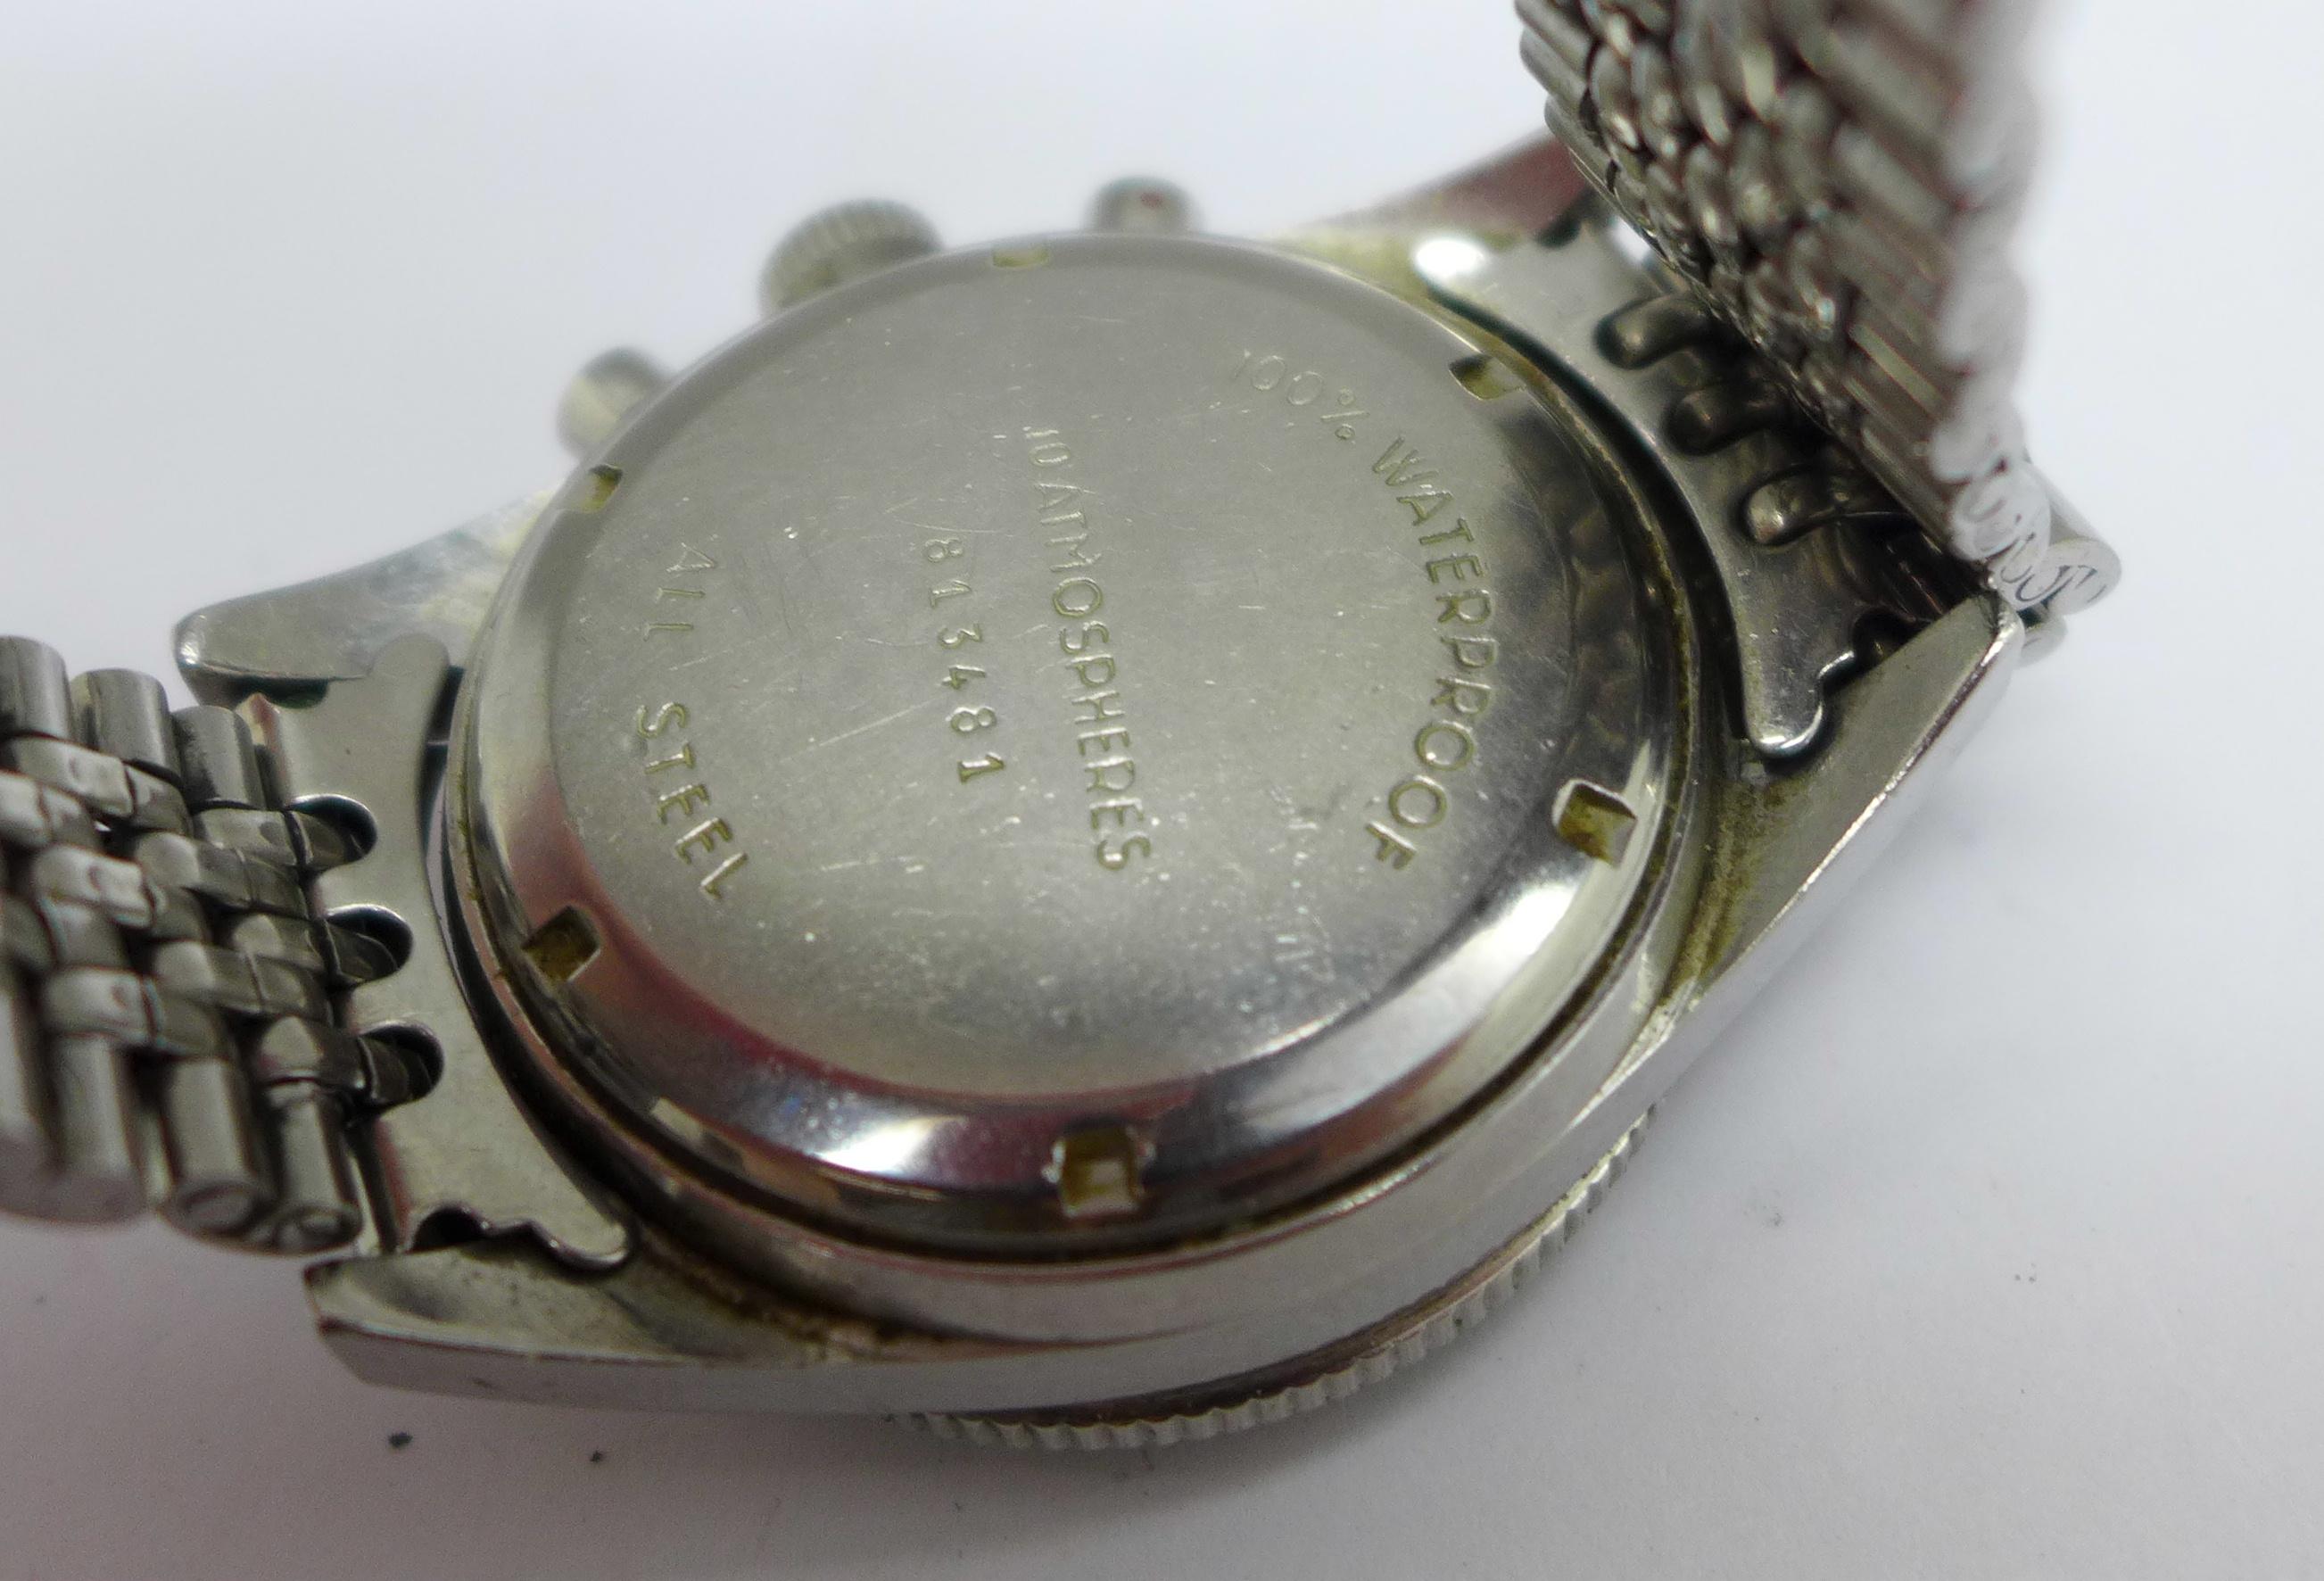 A Yema Yachtingraf 17 jewels chronograph wristwatch on a Seiko bracelet strap, chronograph buttons - Image 7 of 8